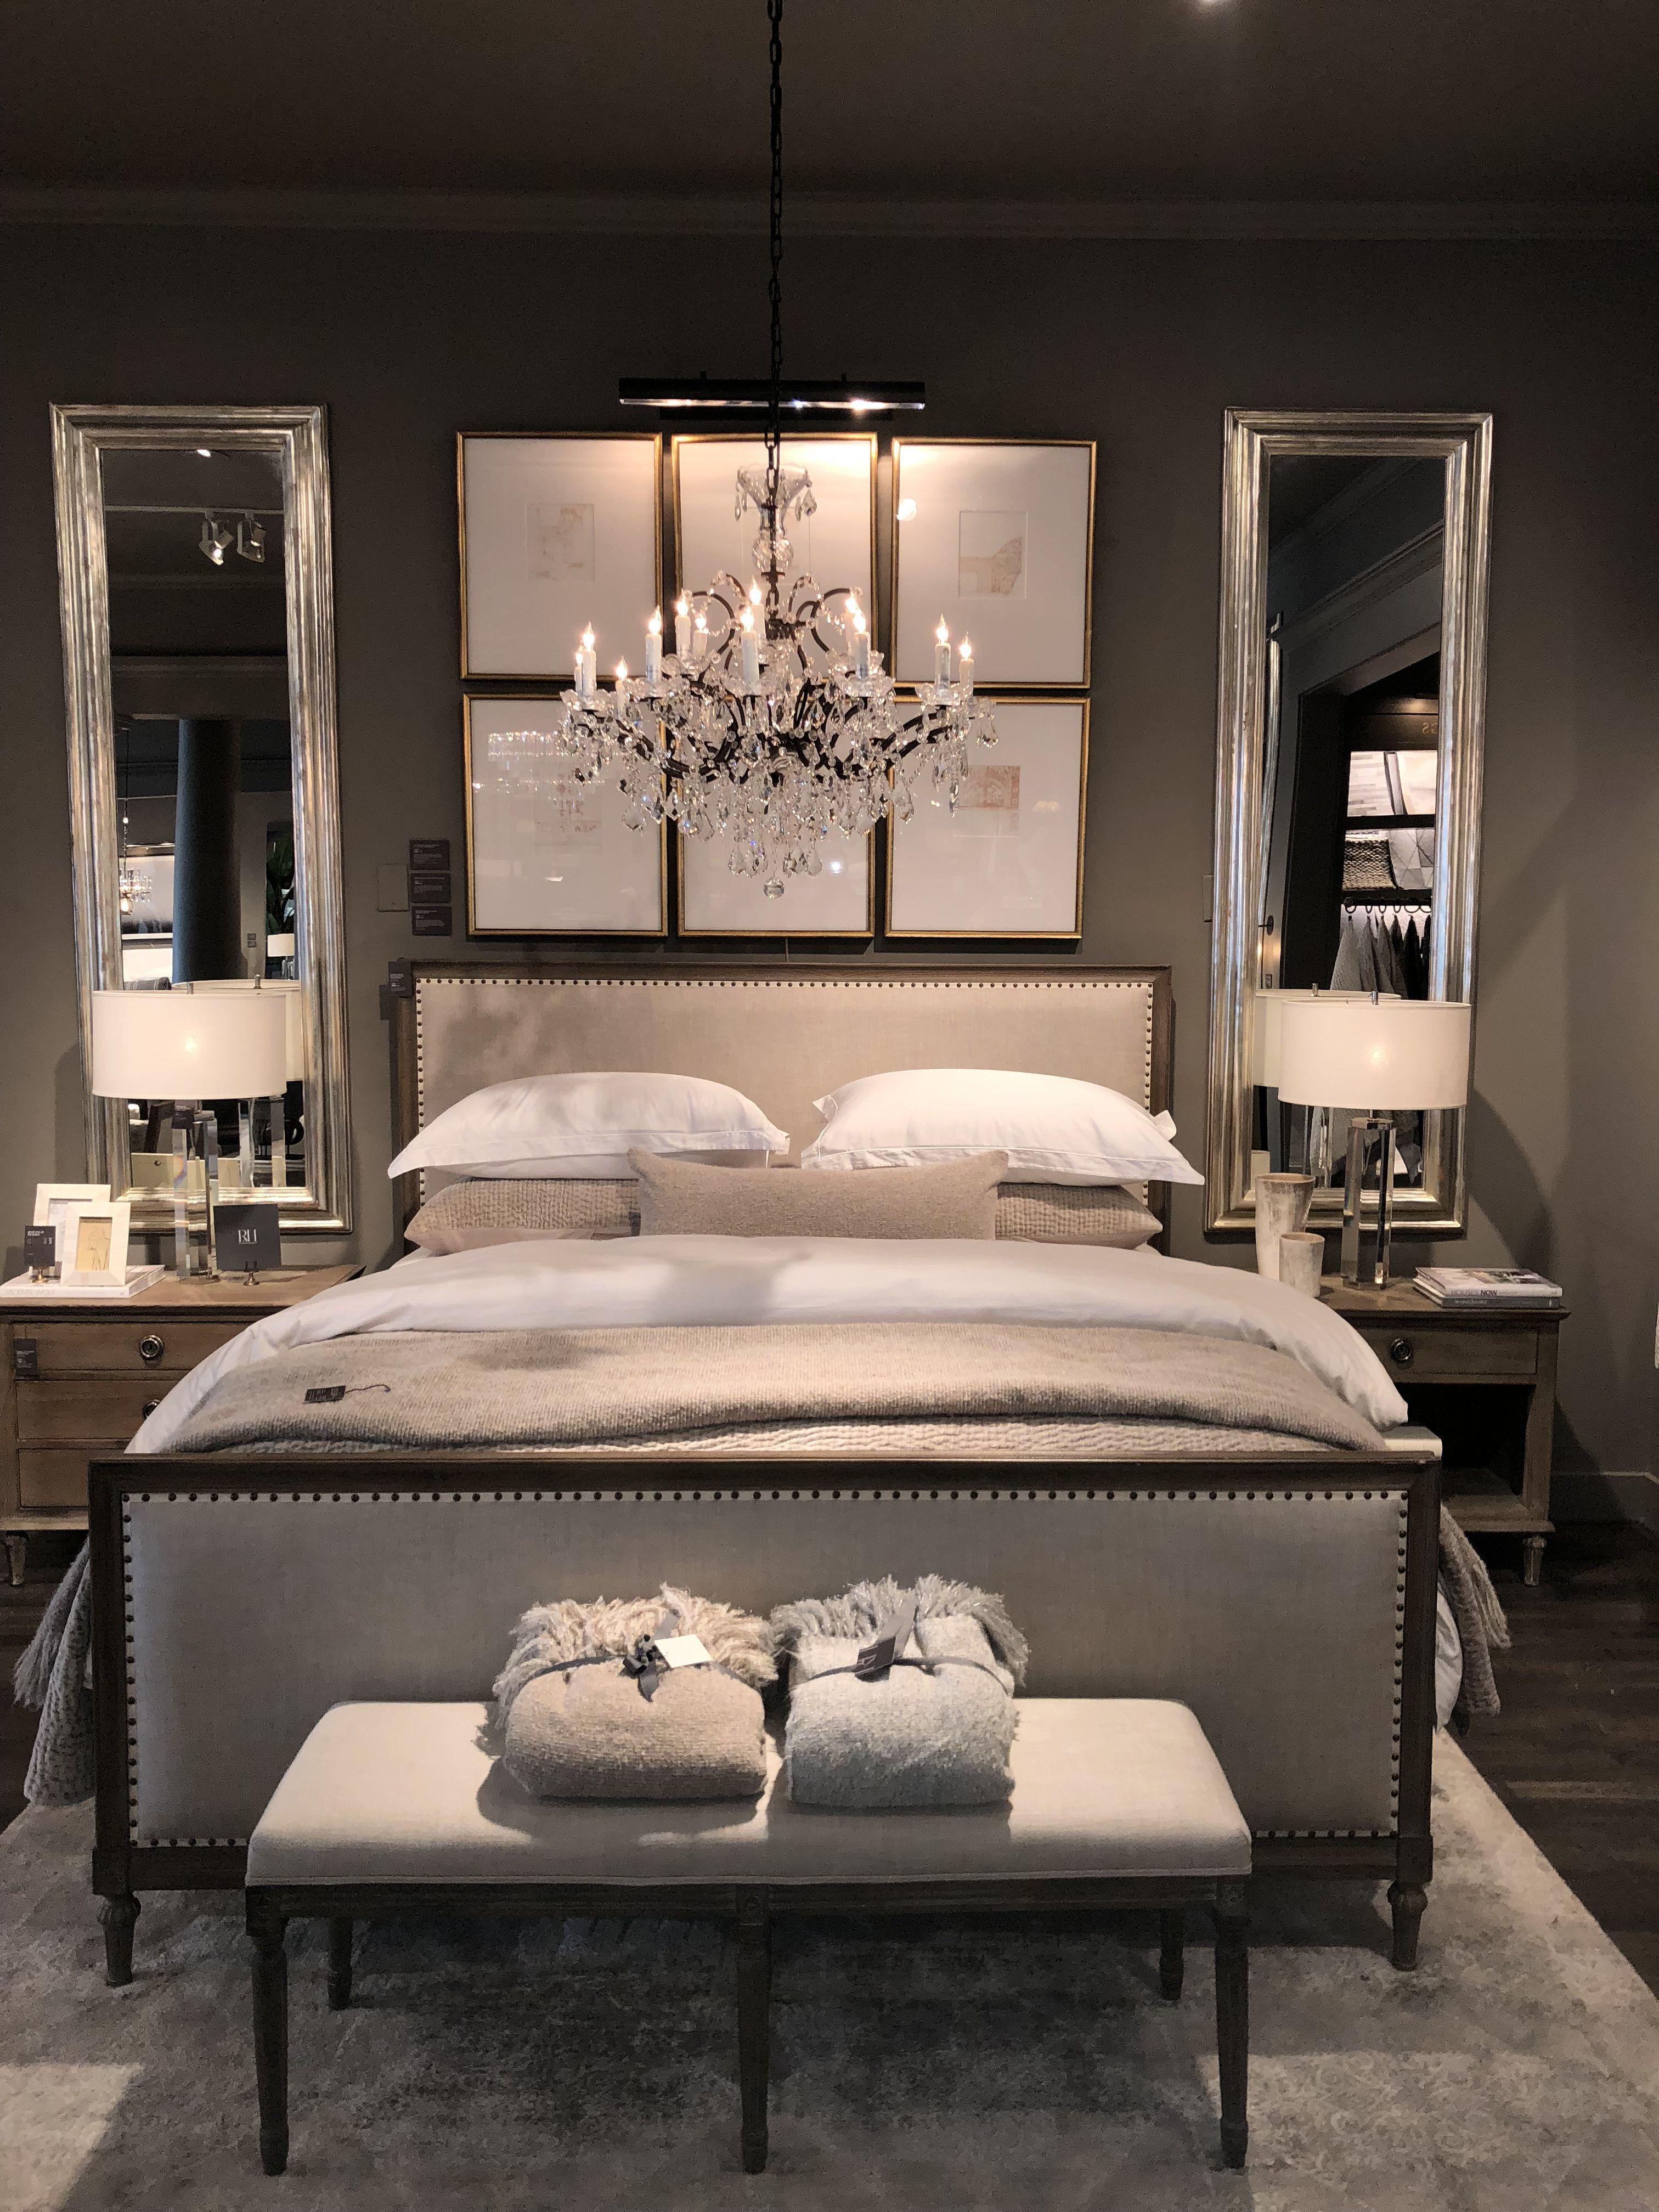 Restoration Hardware Bedroom  Luxury bedroom design, Master